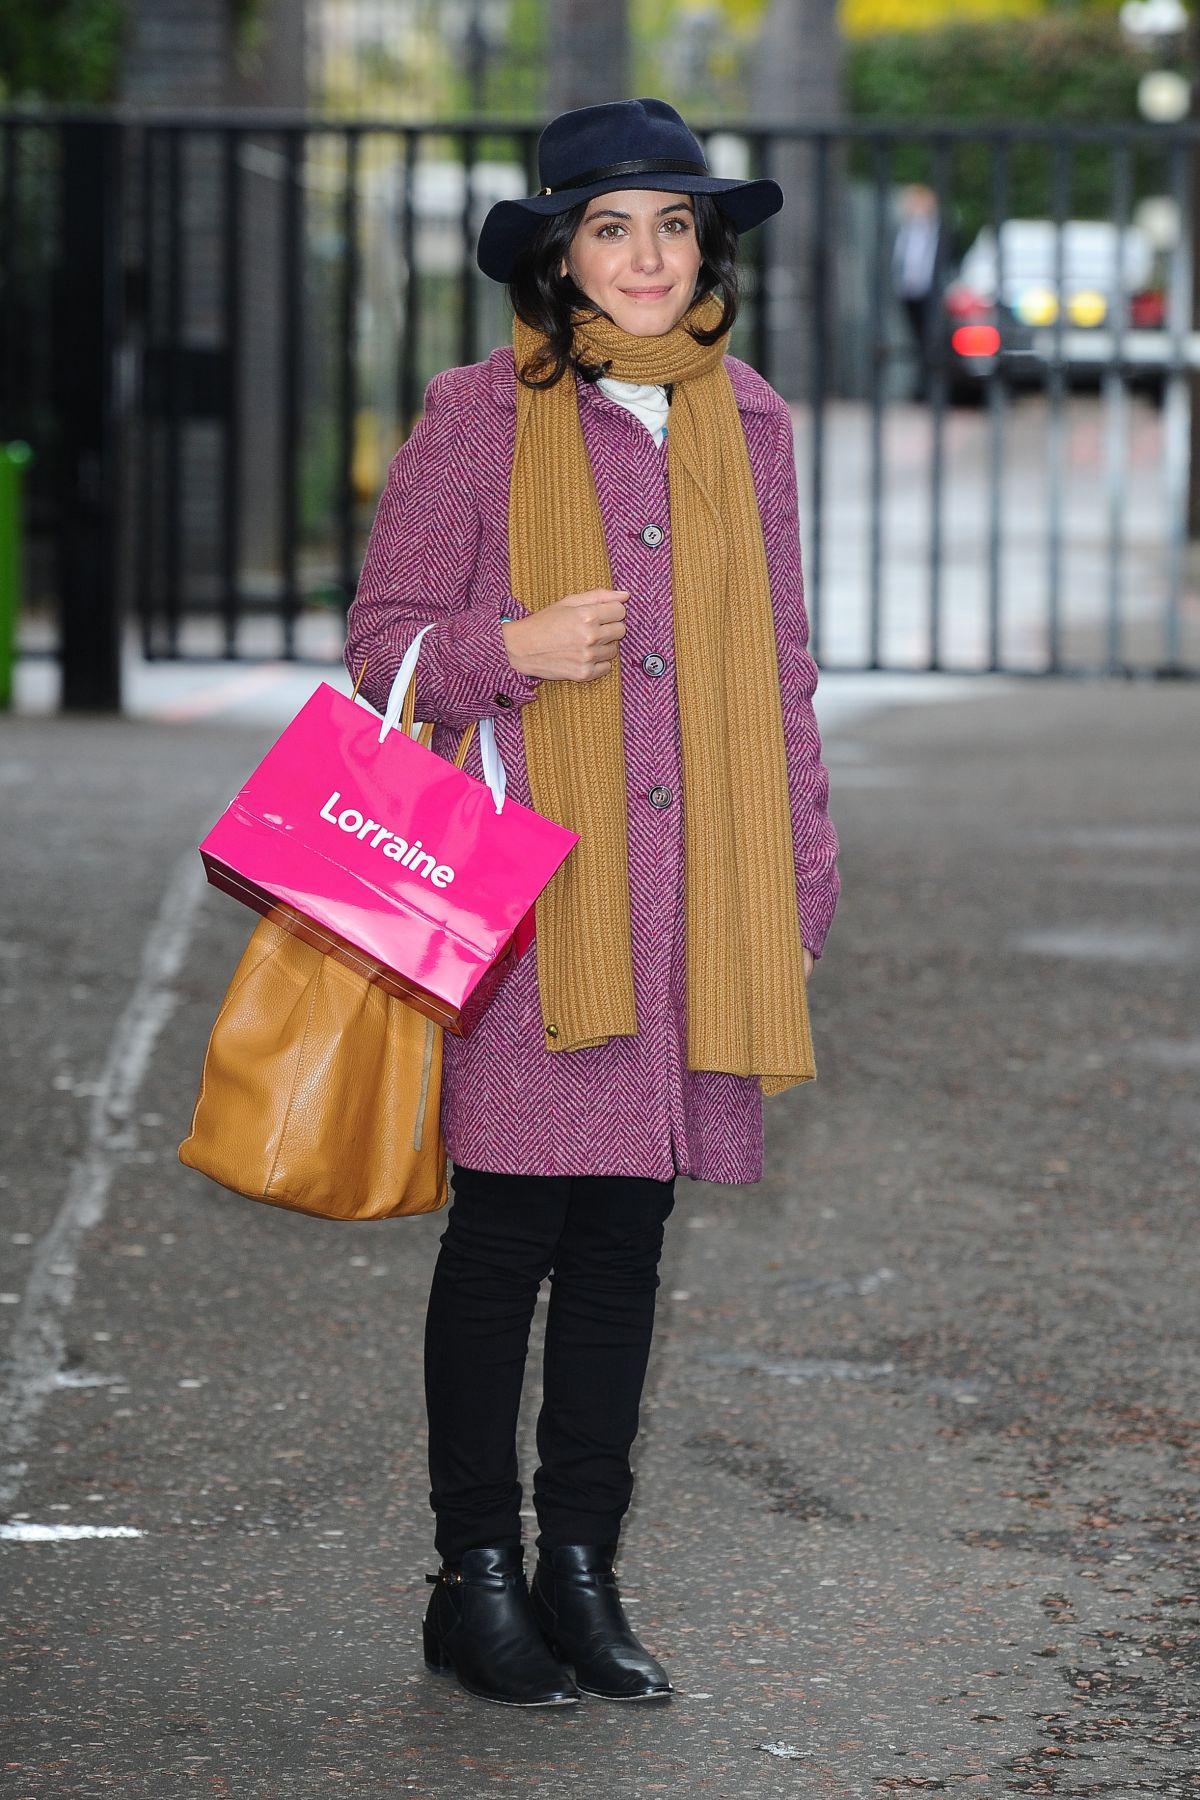 KATIE MELUA at ITV Lorraine Studios in London 10/12/2016